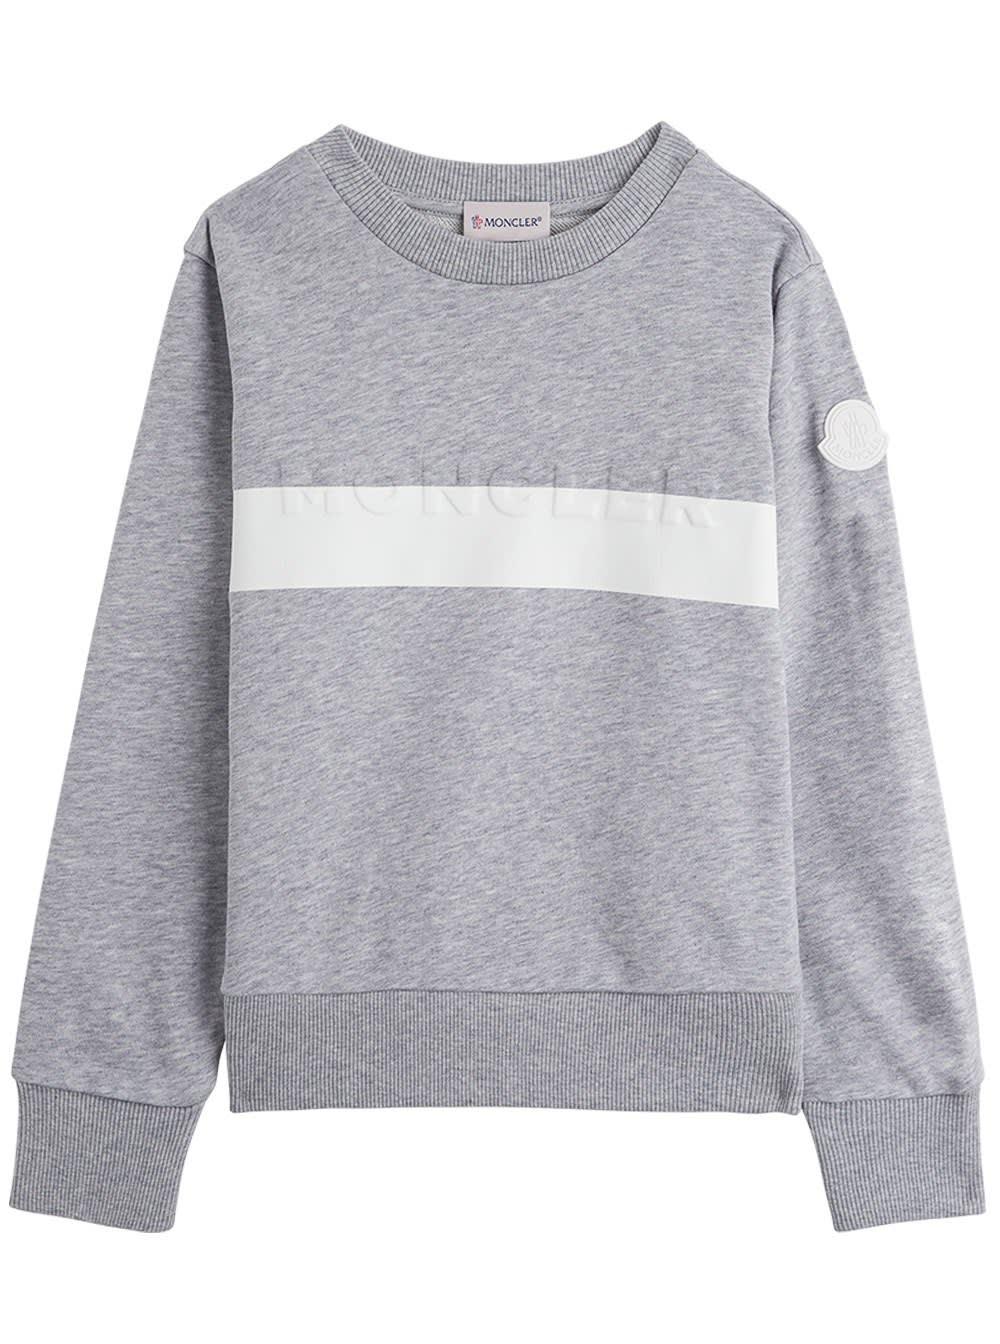 Grey Jersey Sweatshirt With Logo